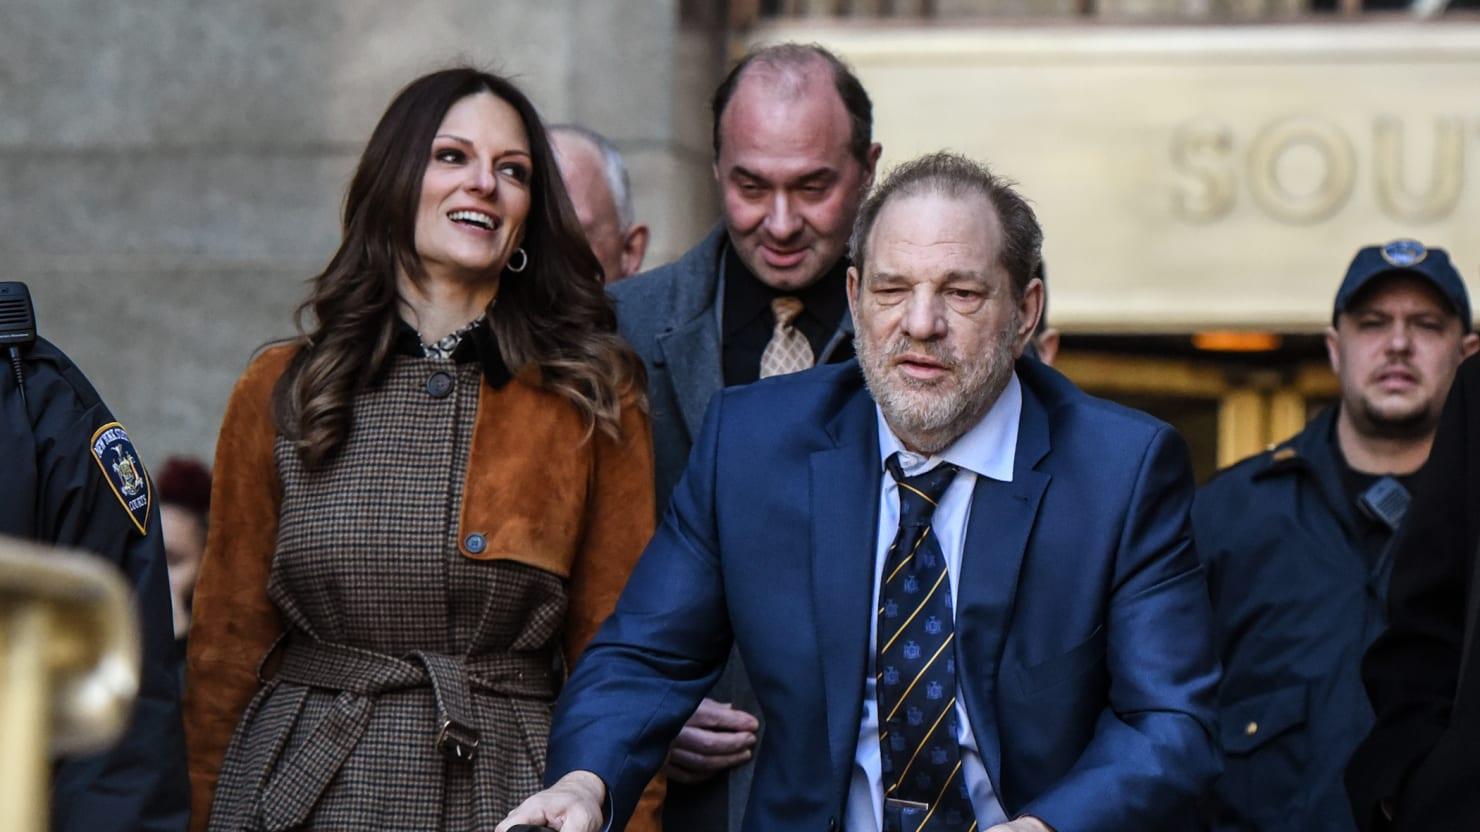 Harvey Weinstein's Attorney Accused of 'Jury Tampering' After Newsweek Op-Ed